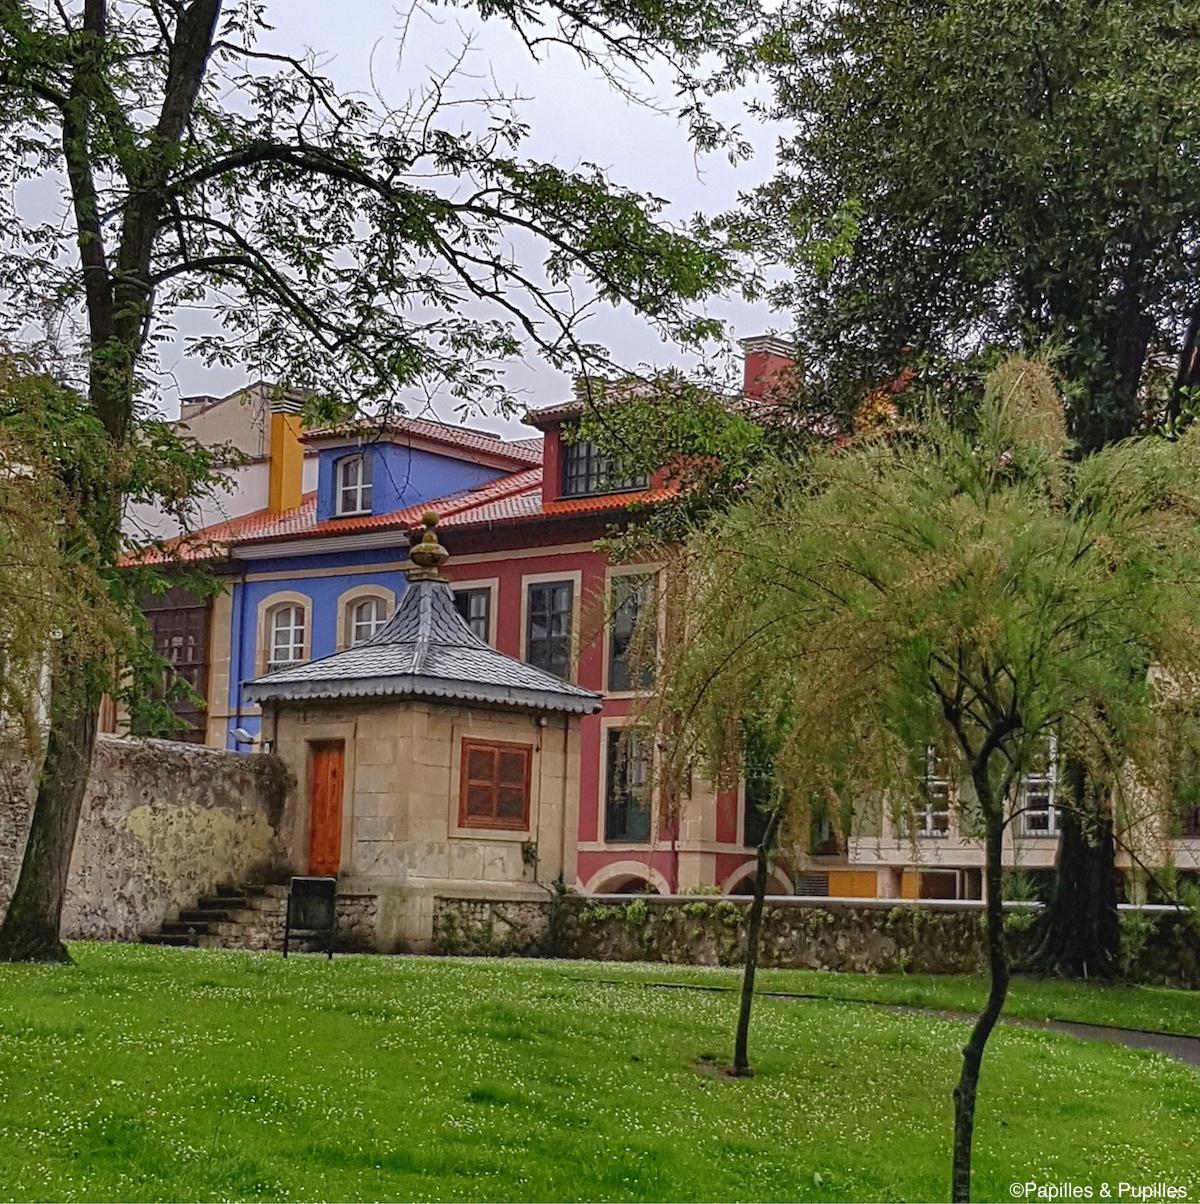 Aviles - Le parc Ferrera